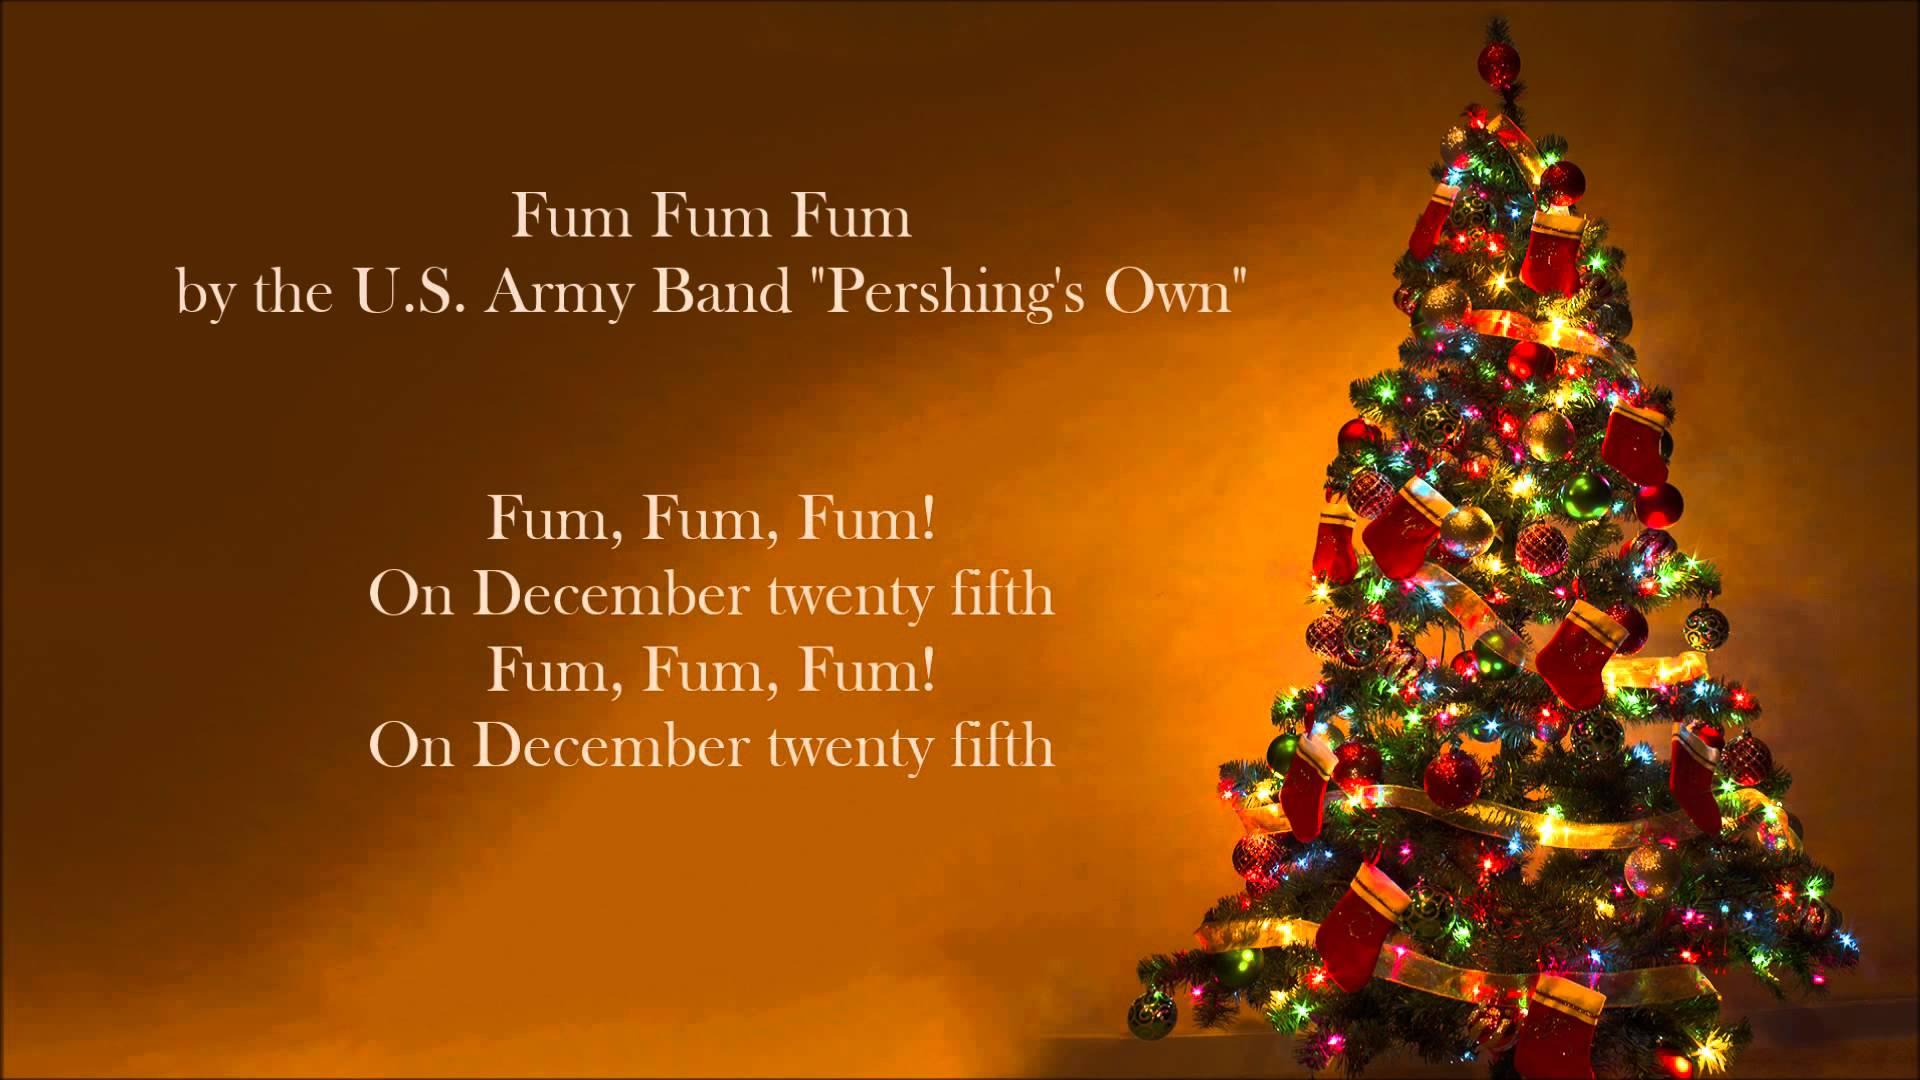 Song lyrics to a Spanish Christmas carol, Fum, Fum, Fum